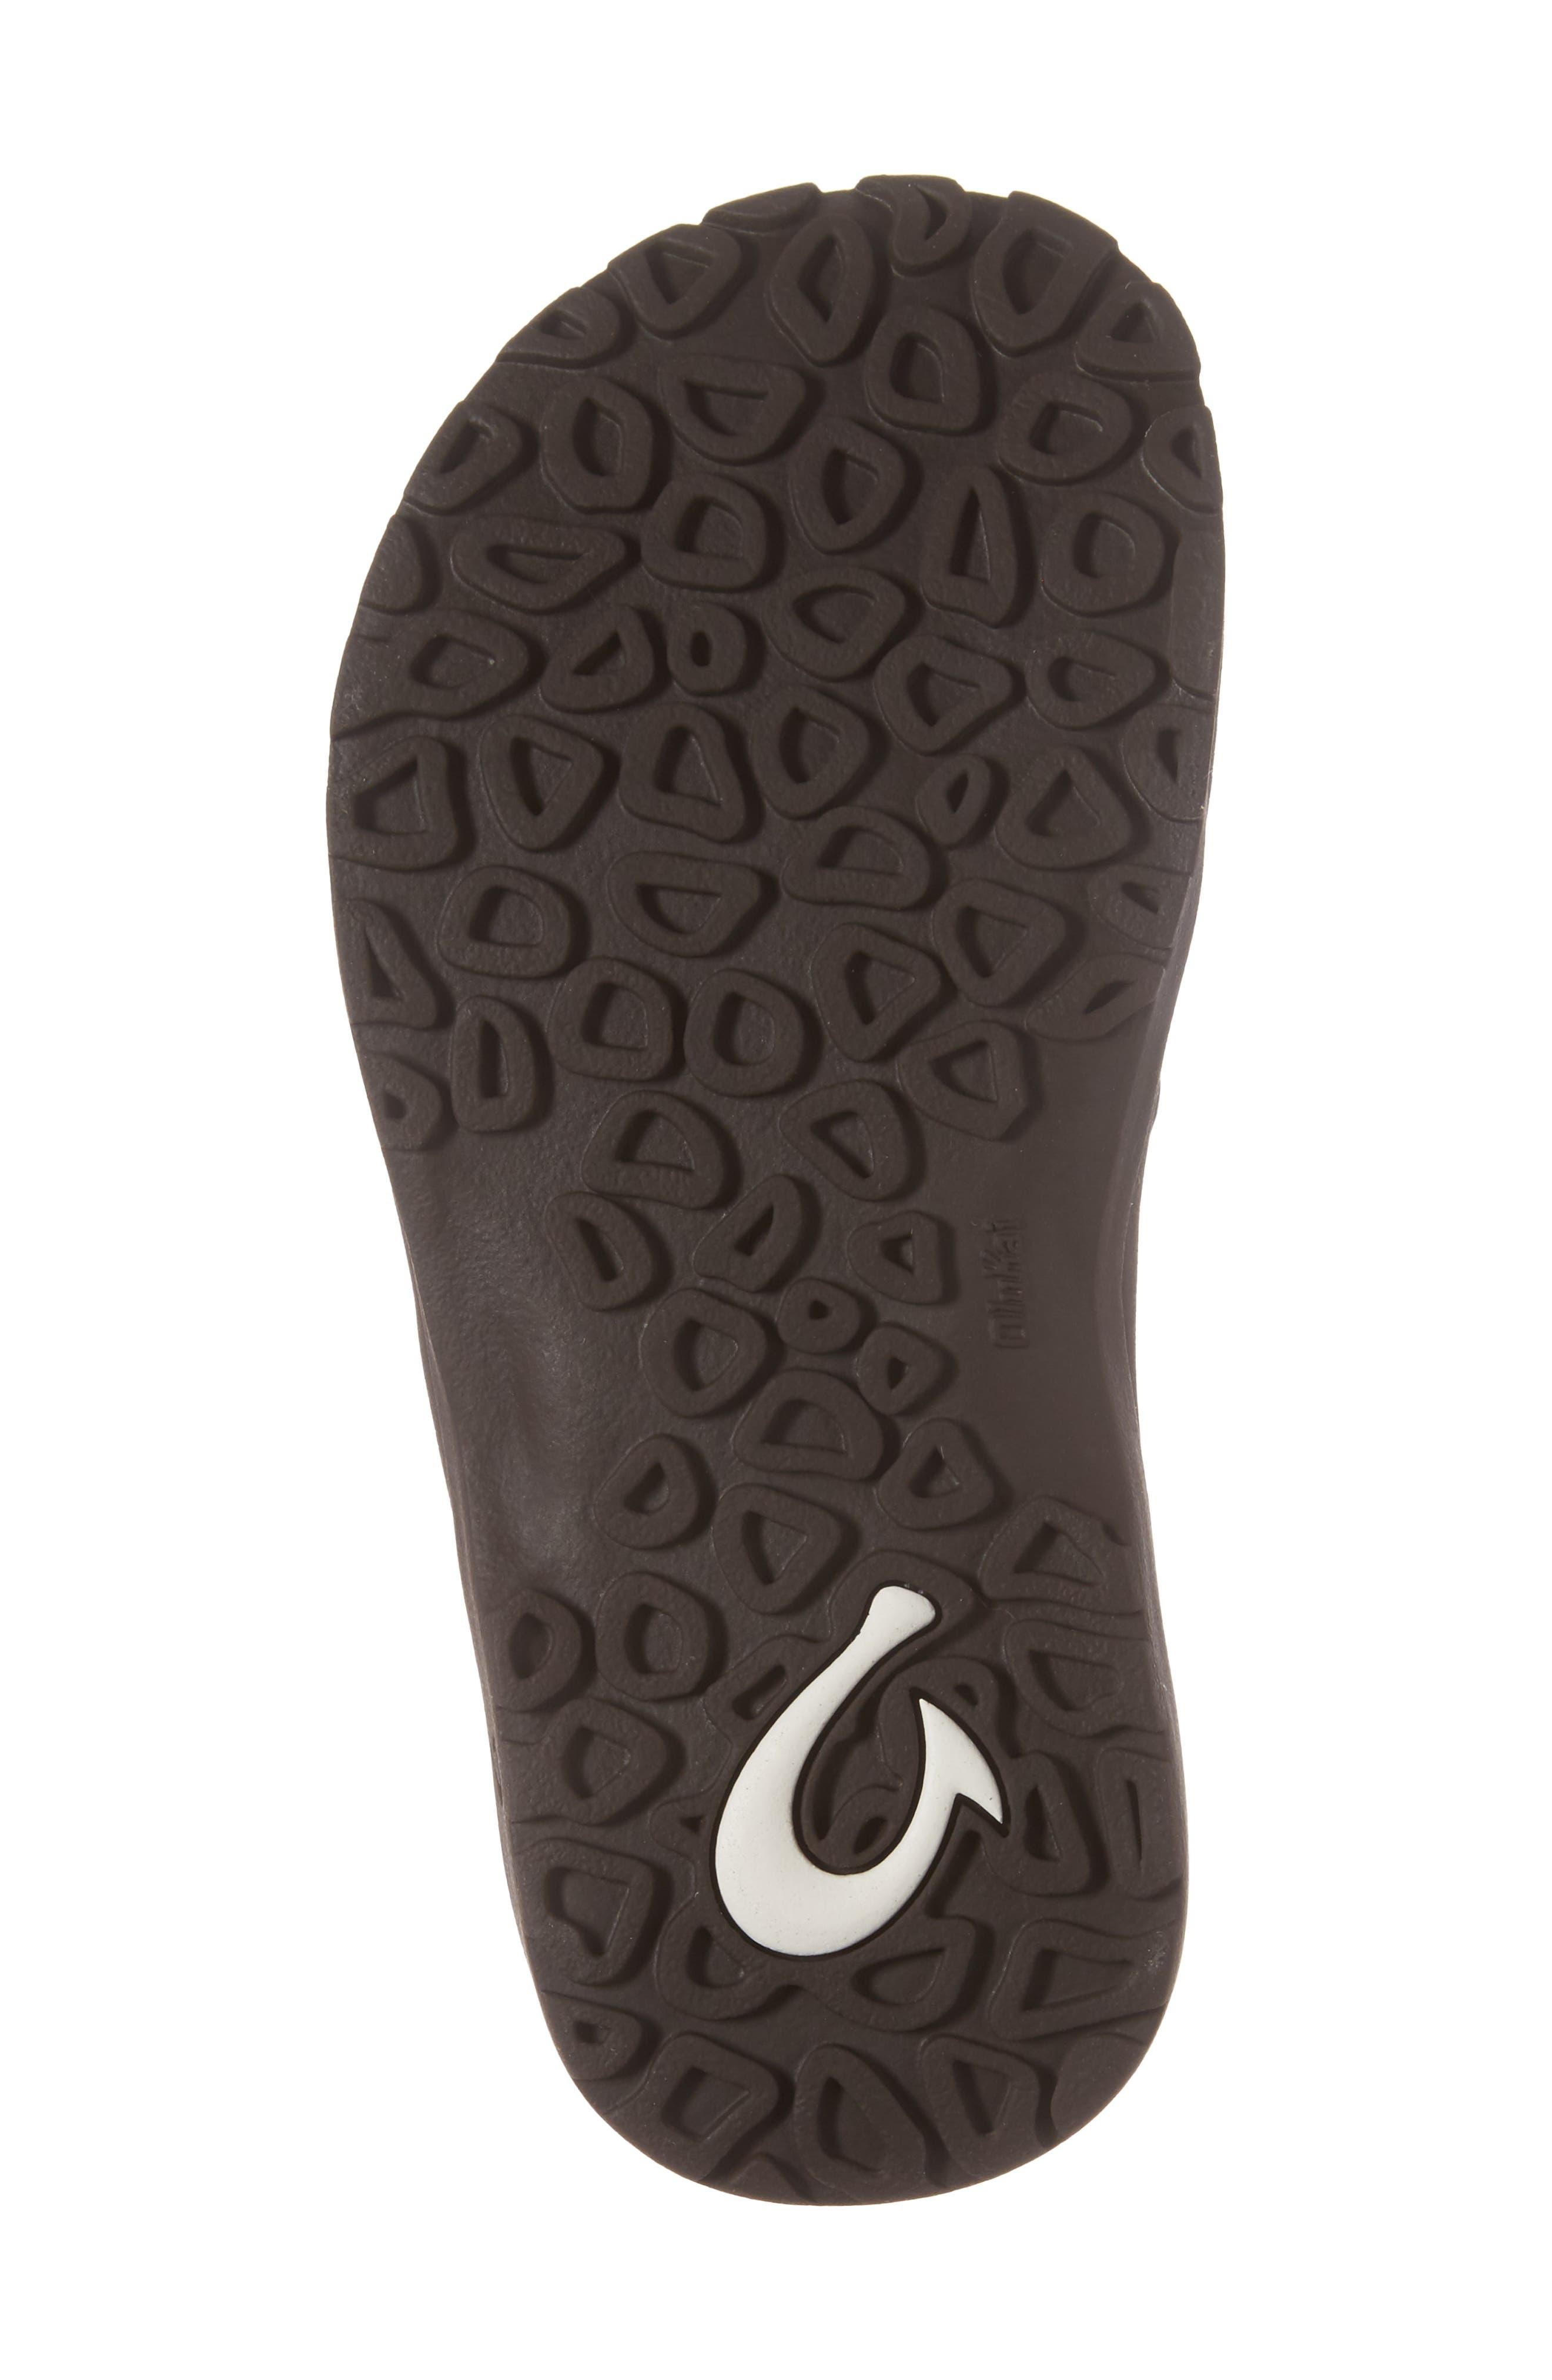 OLUKAI,                             Nui Leather Sandal,                             Alternate thumbnail 6, color,                             SEAL BROWN/ DARK JAVA